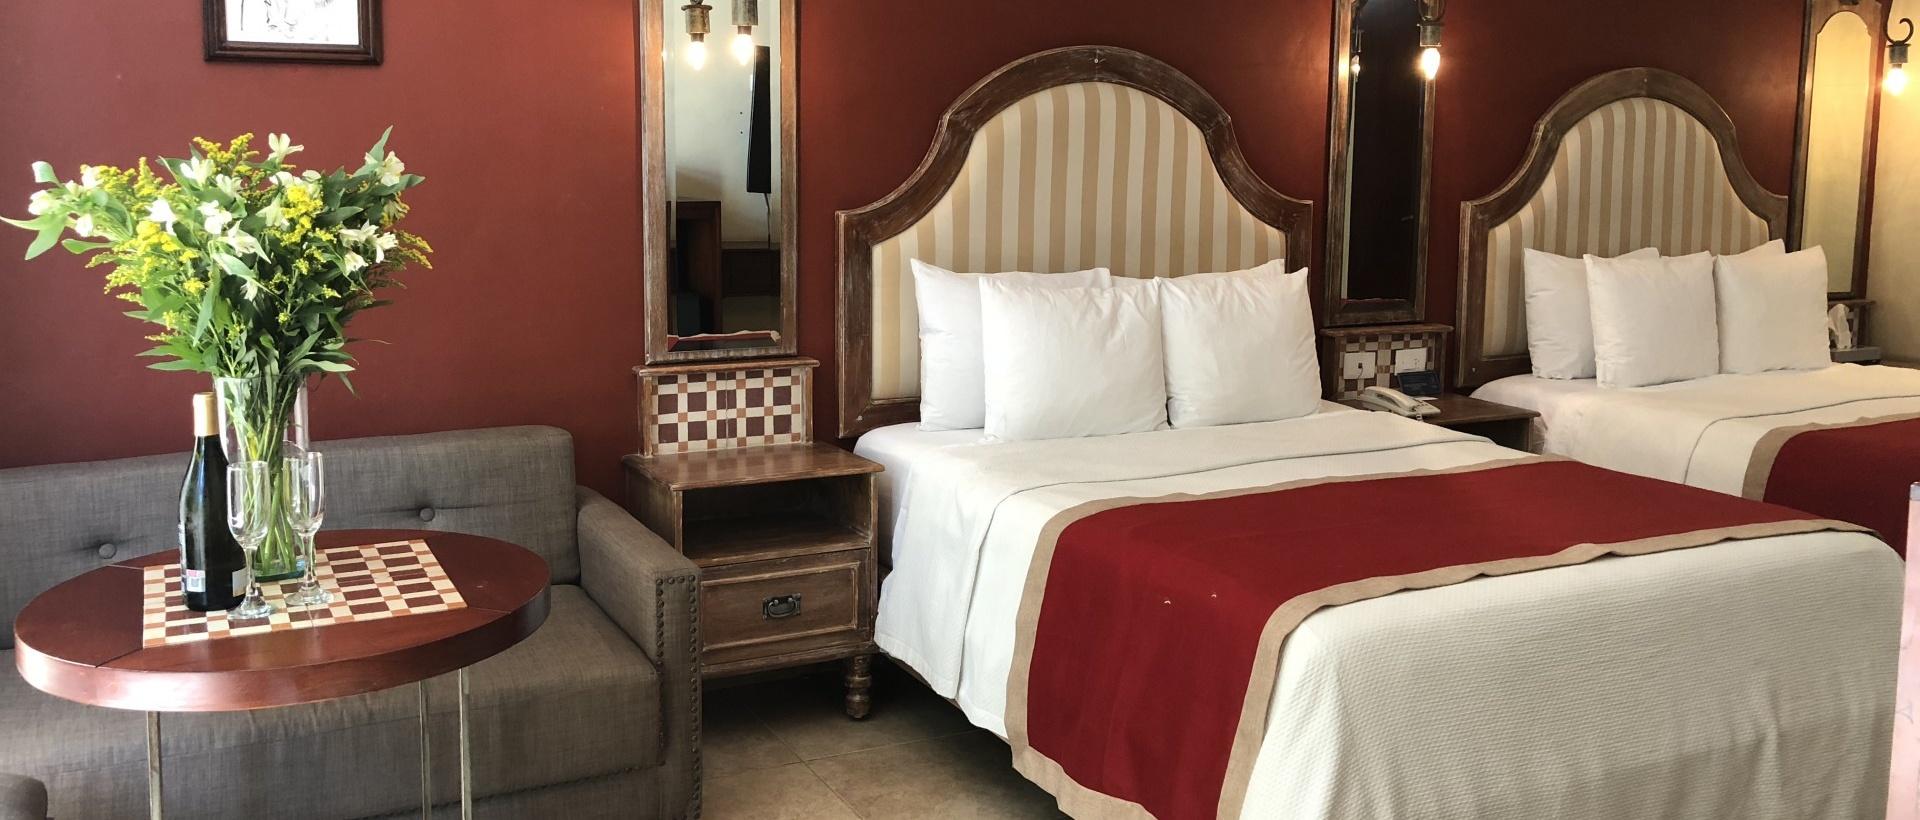 Hotel Casa Italia